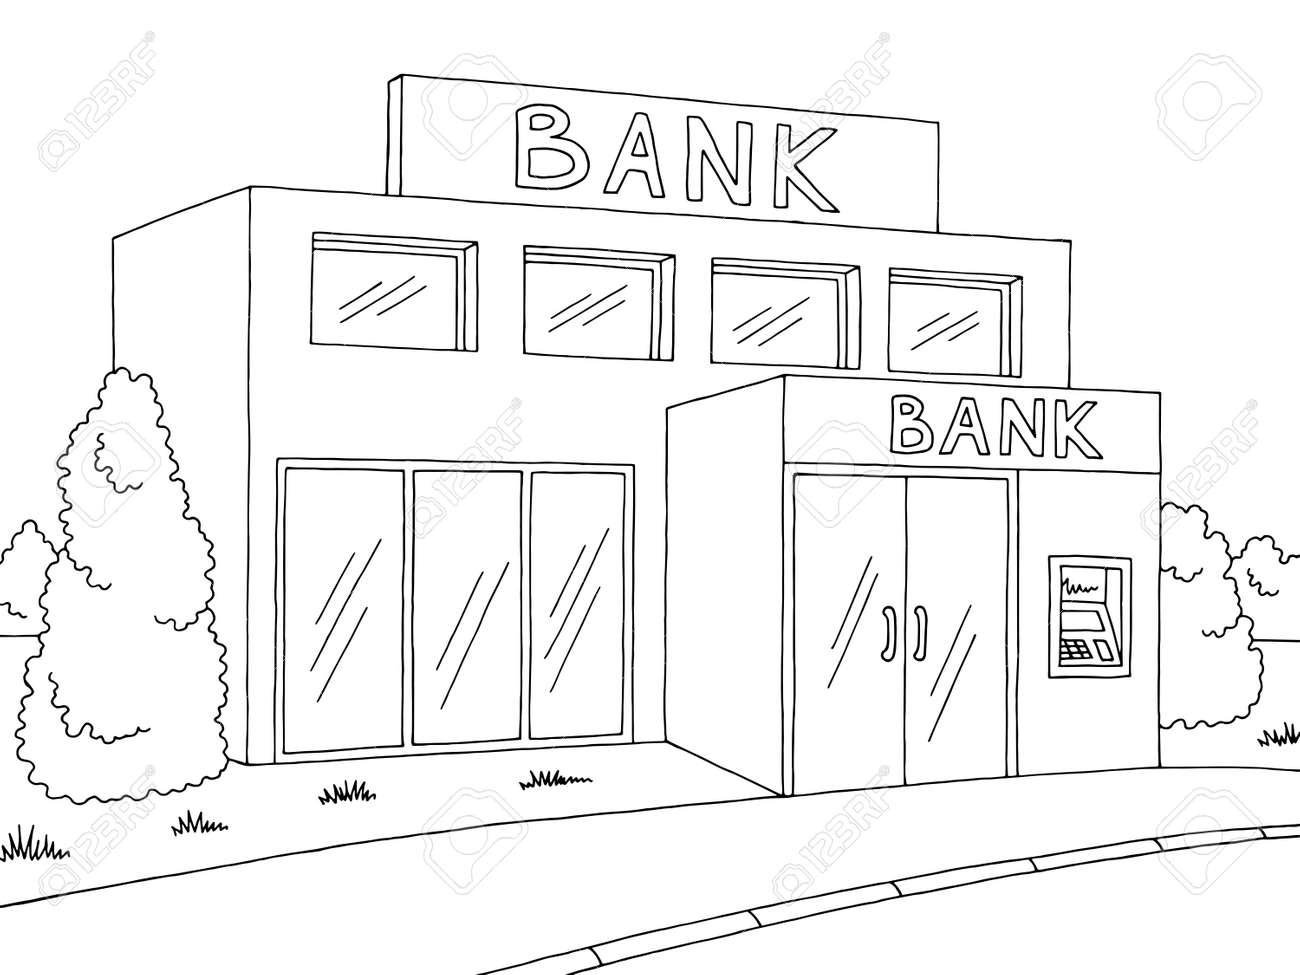 Bank Exterior Graphic Black White Sketch Illustration Vector Royalty